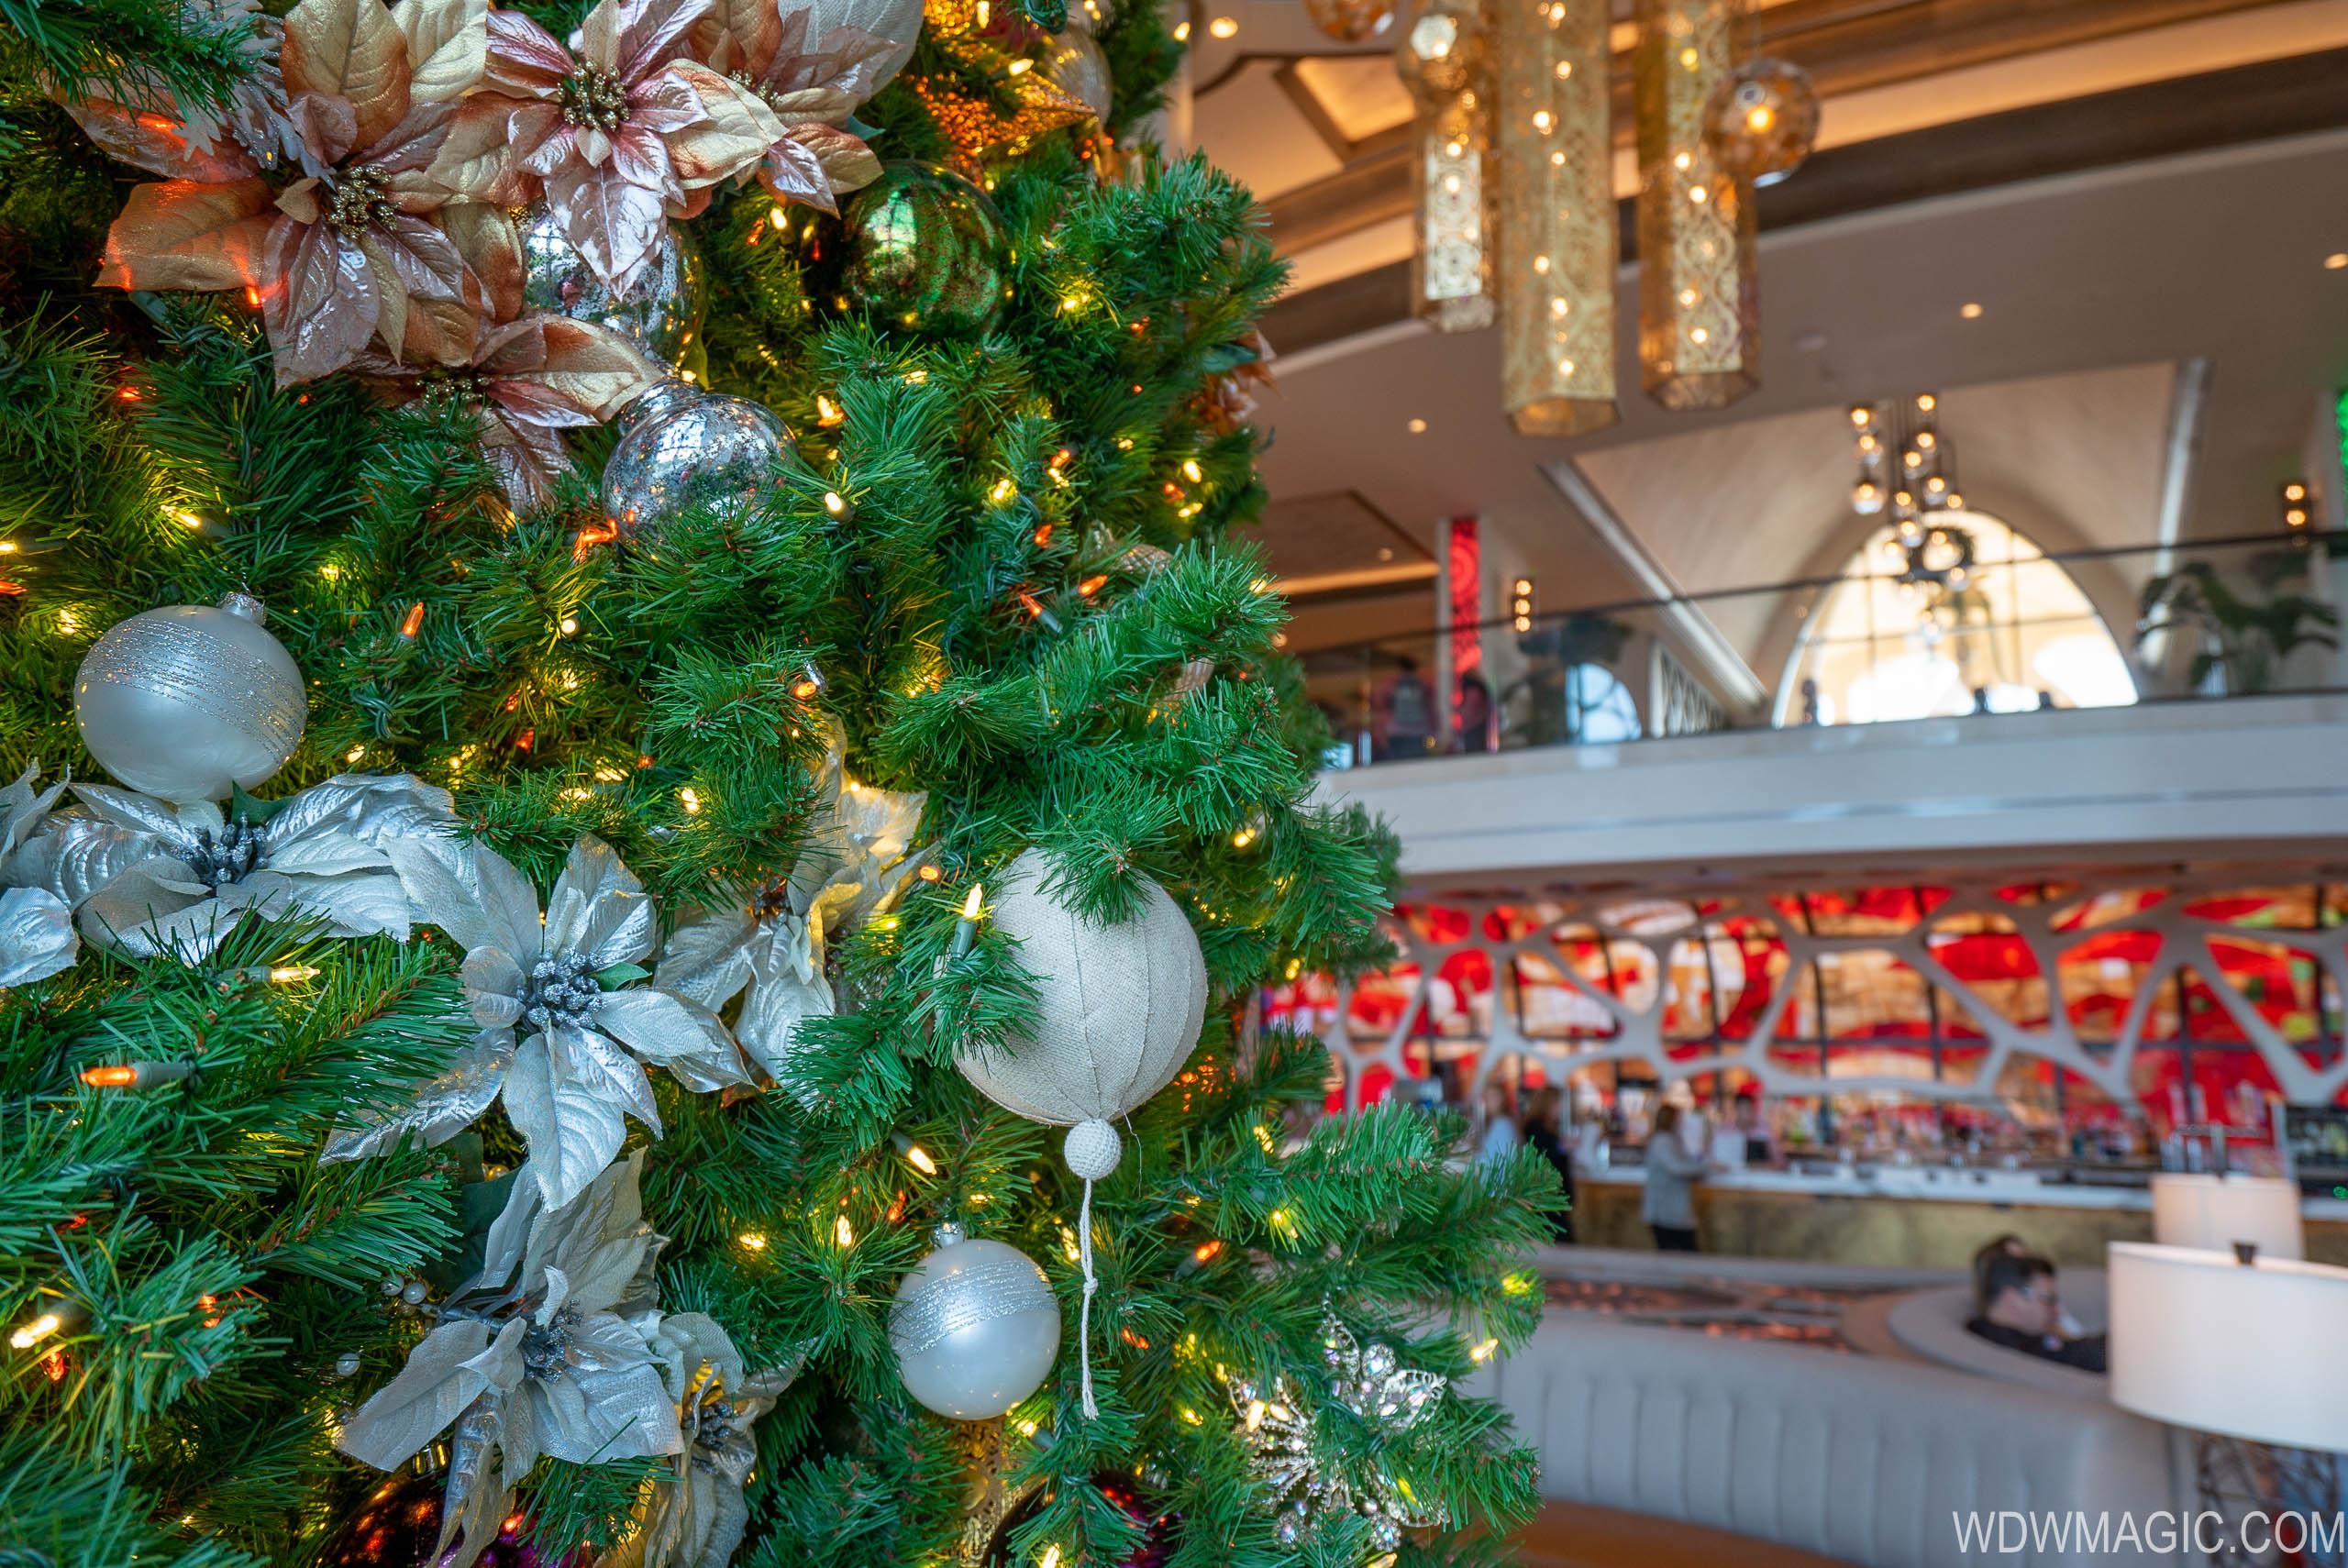 Gran Destino Tower Christmas Holiday decor 2019